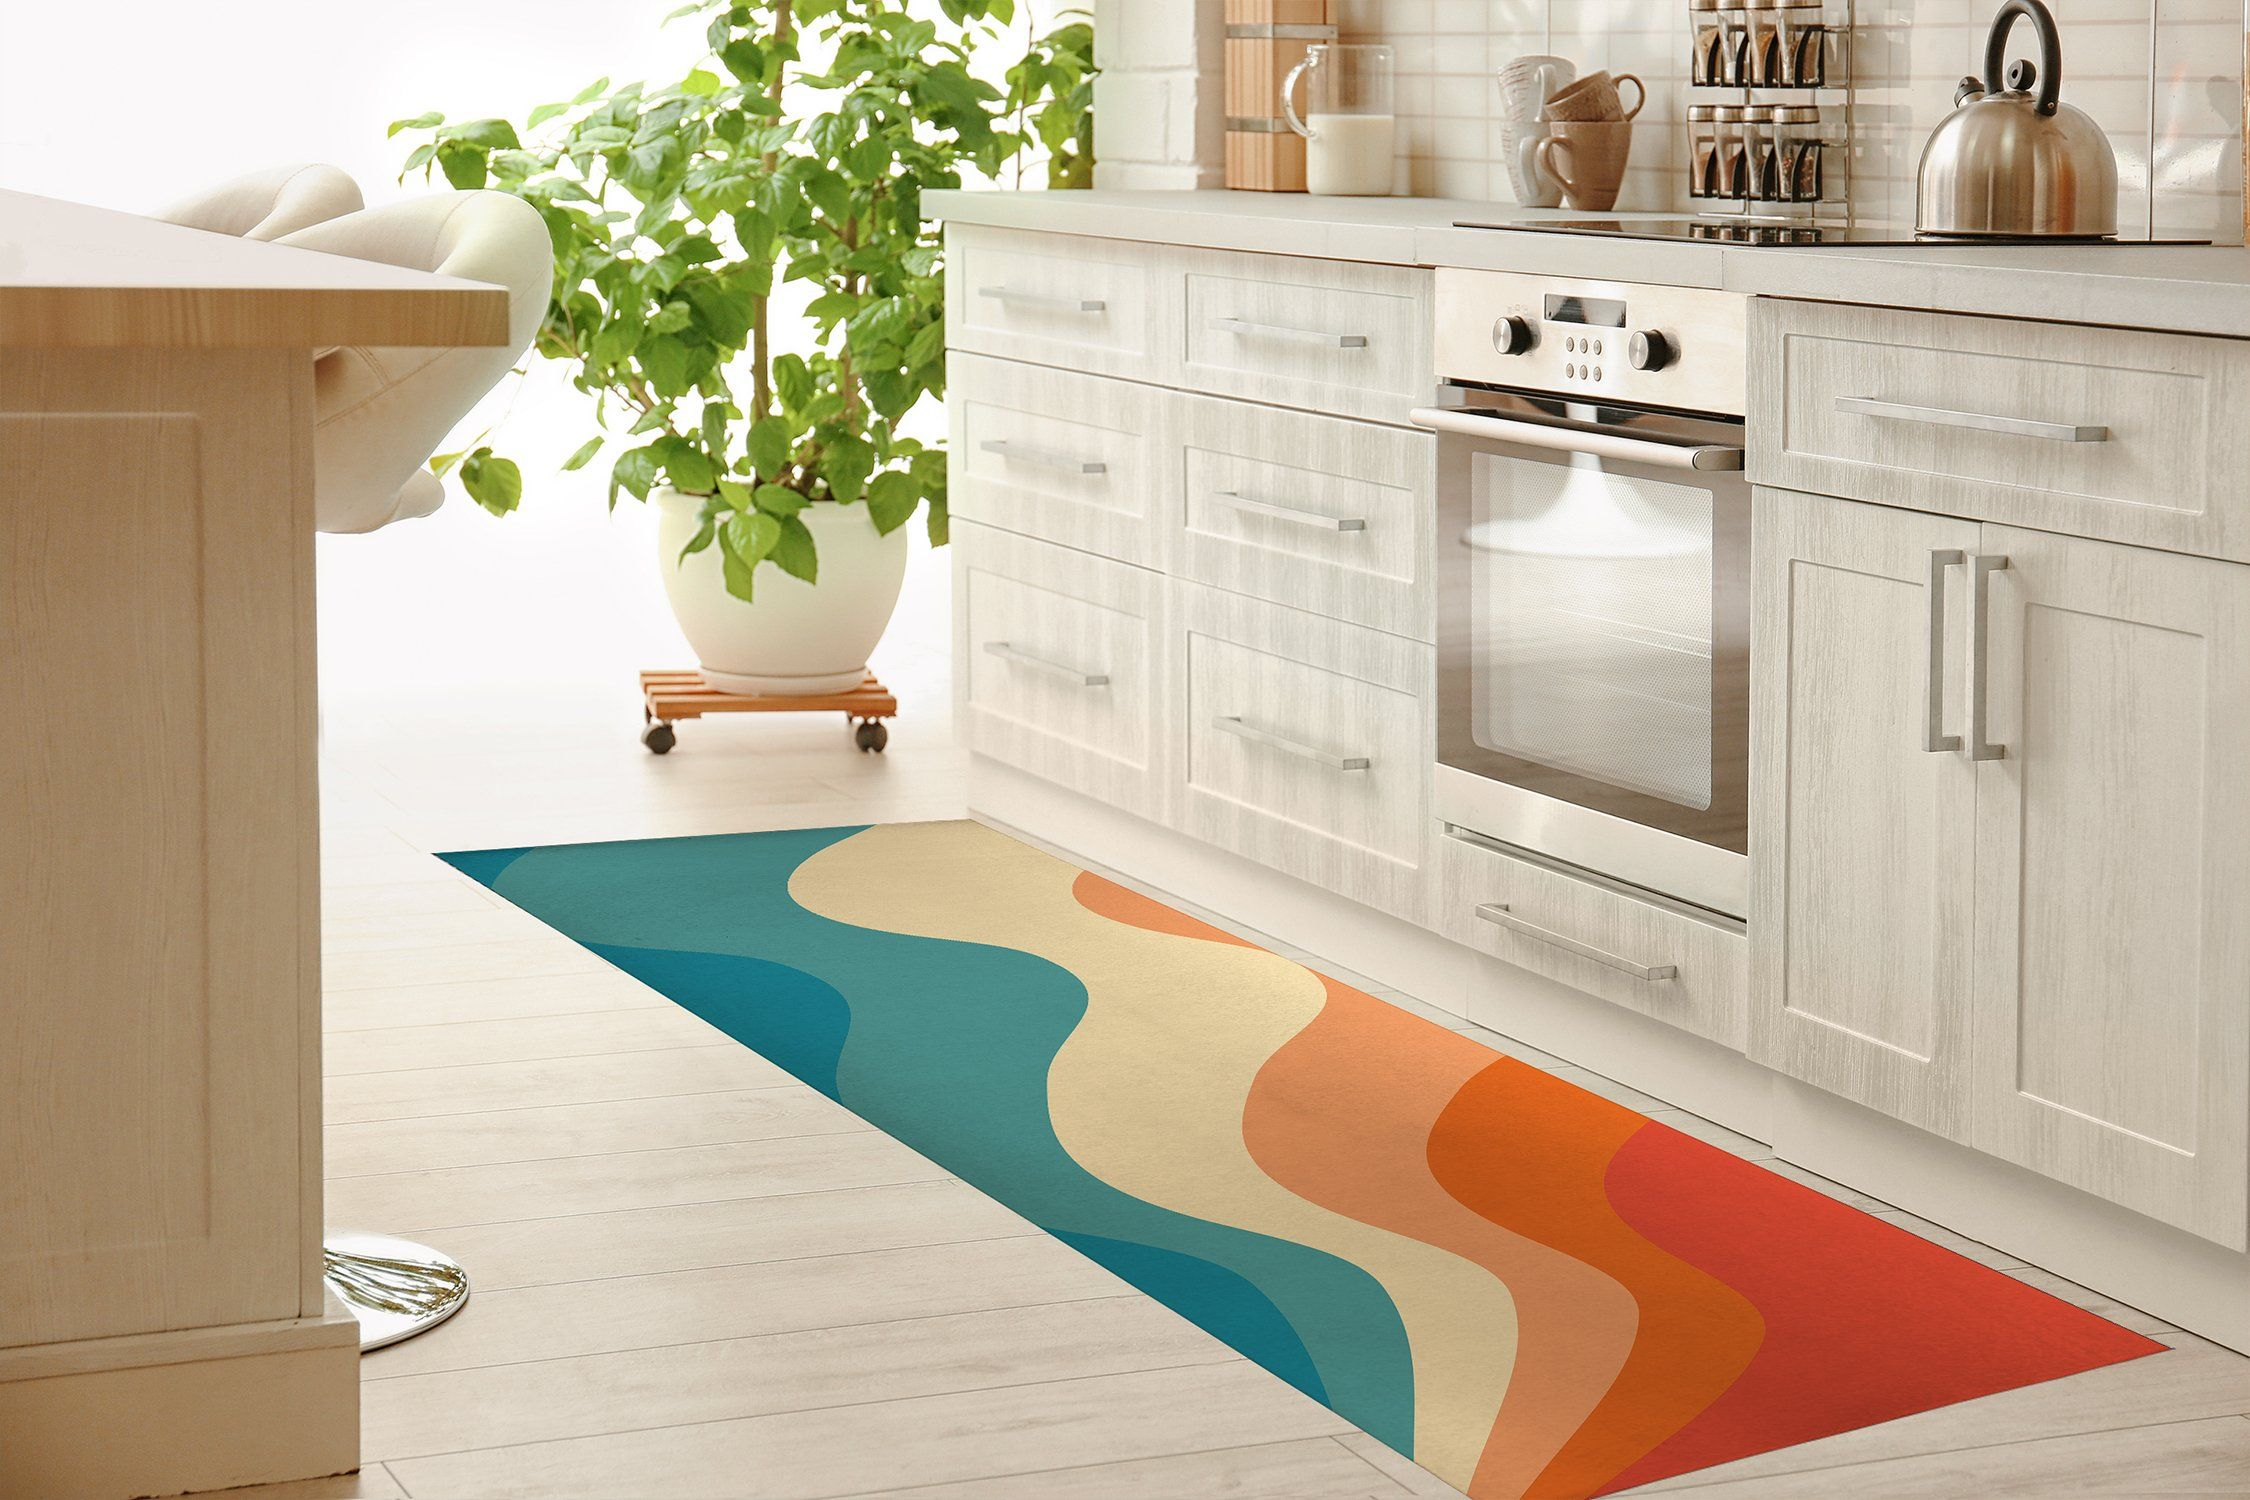 SNOOP SWIVEL Kitchen Mat By Terri Ellis – Runner 2.6ft x 8ft